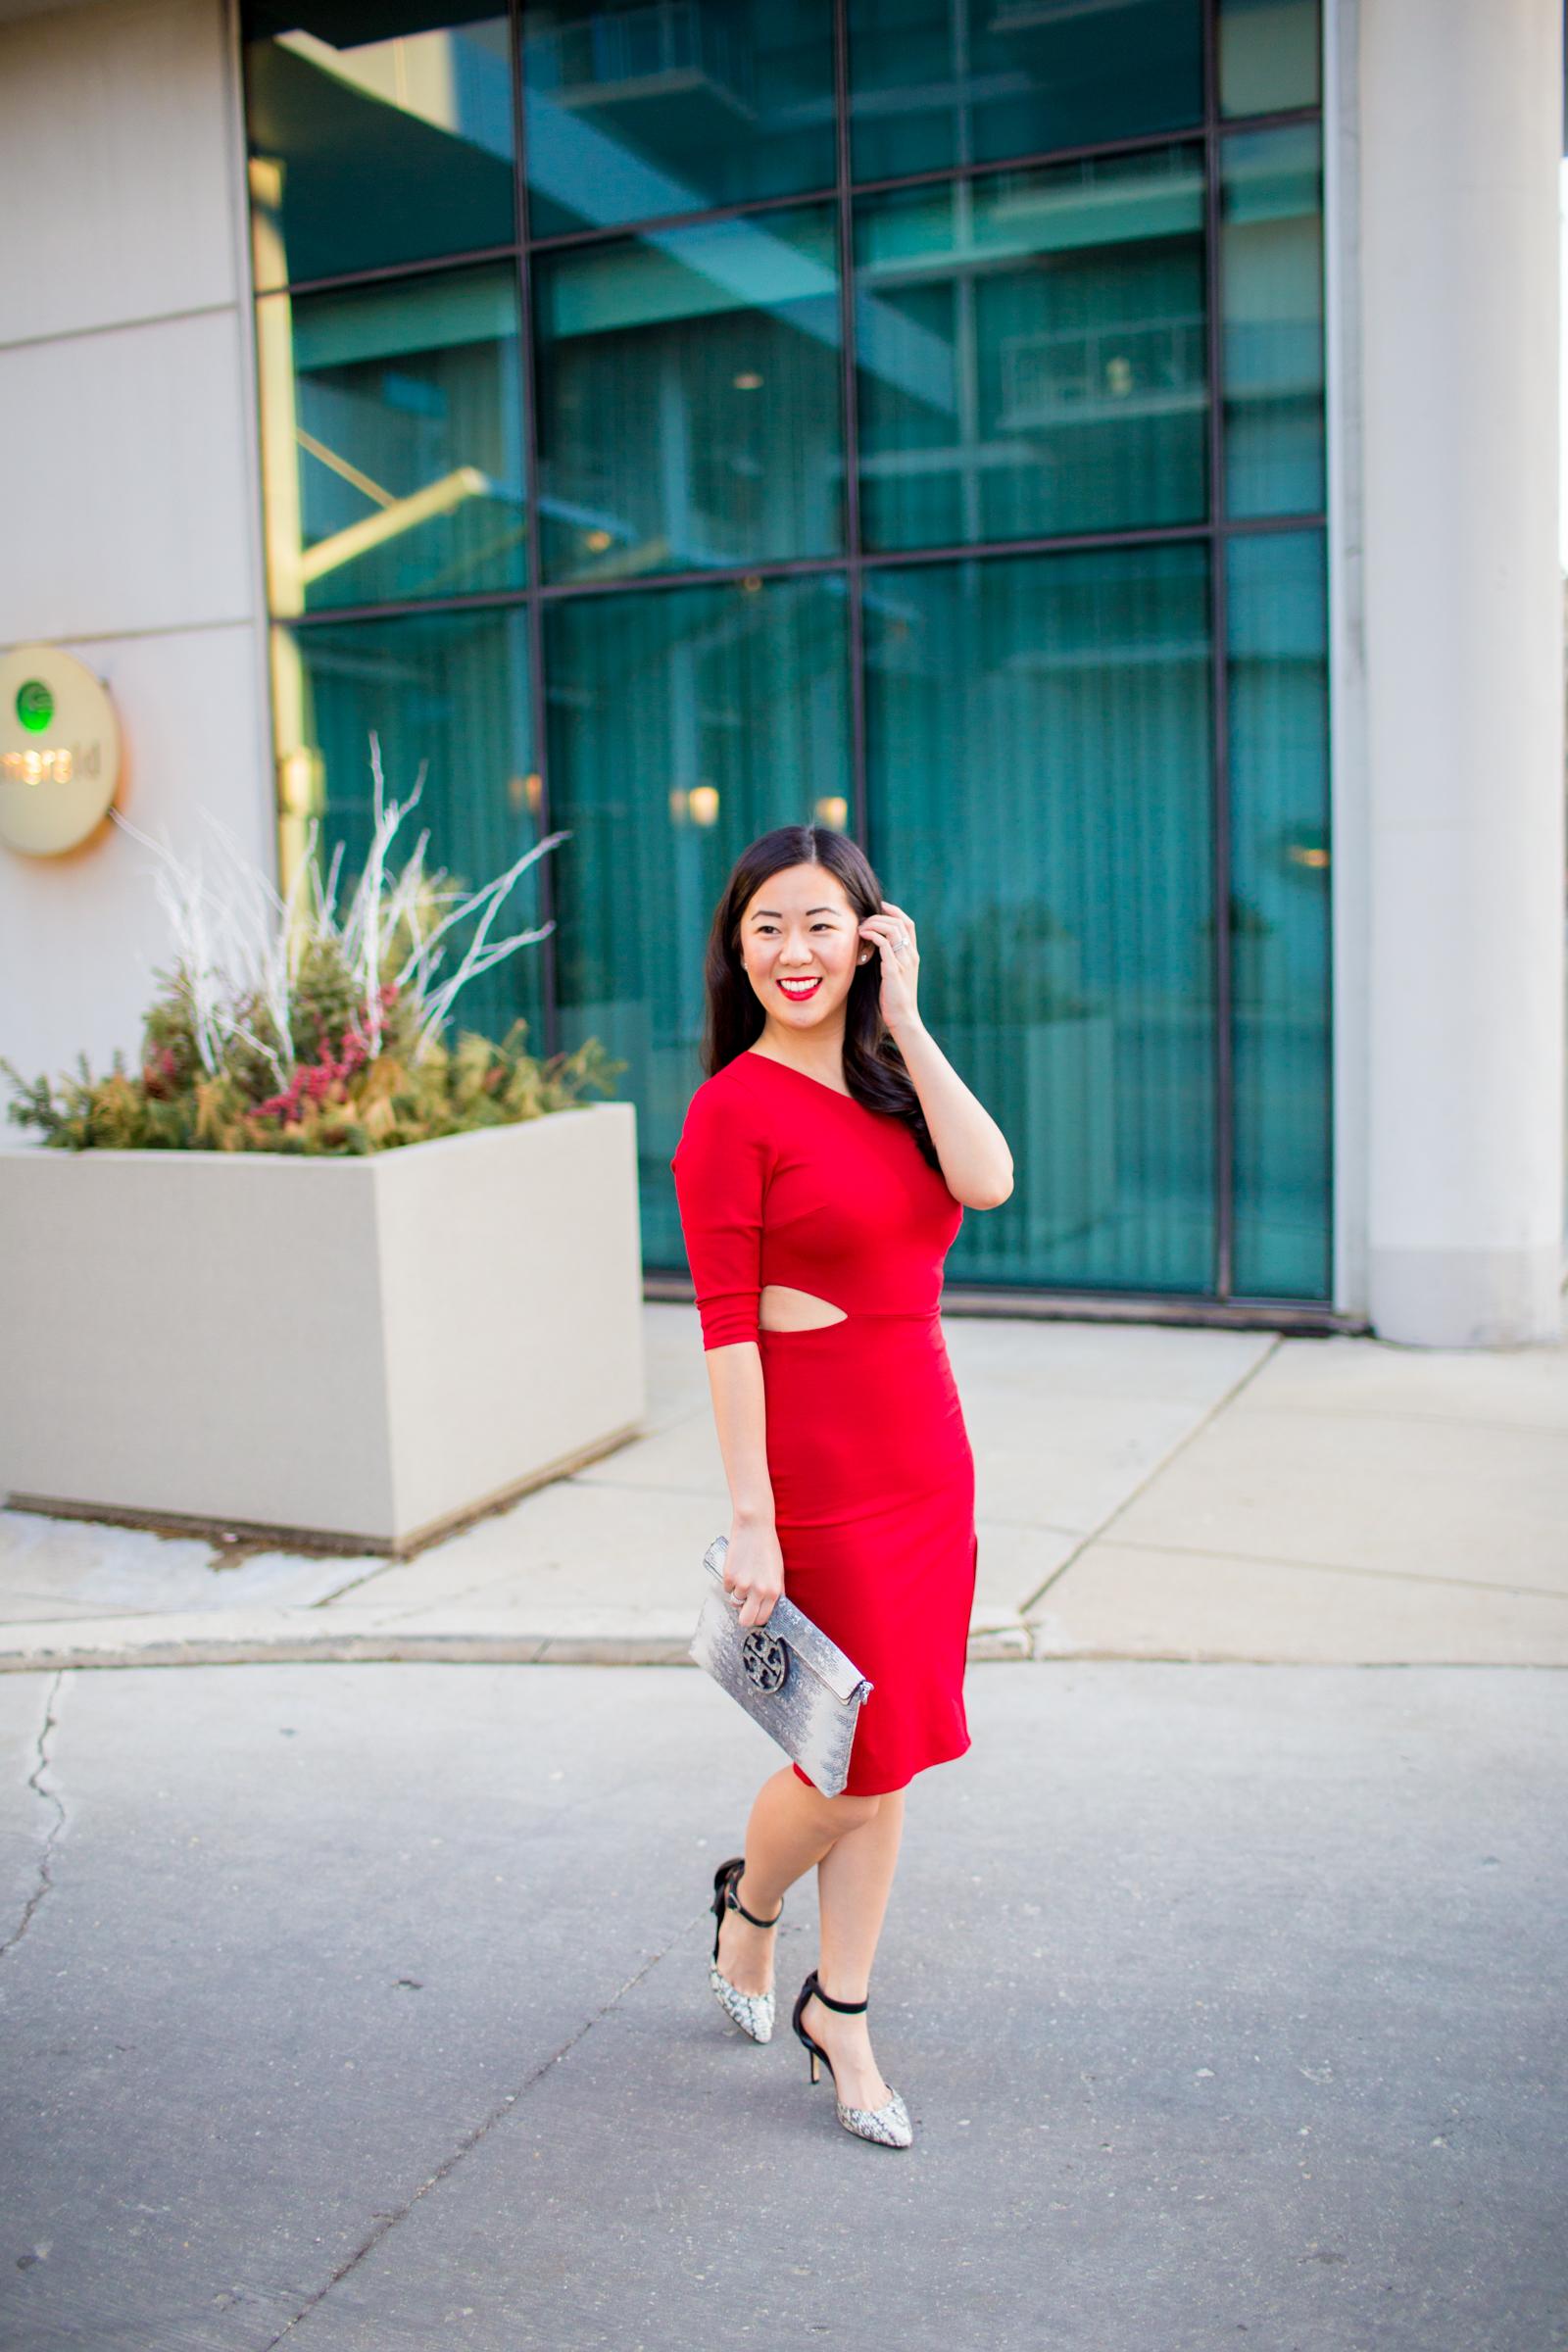 A Little Red Party Dress - Tia Perciballi